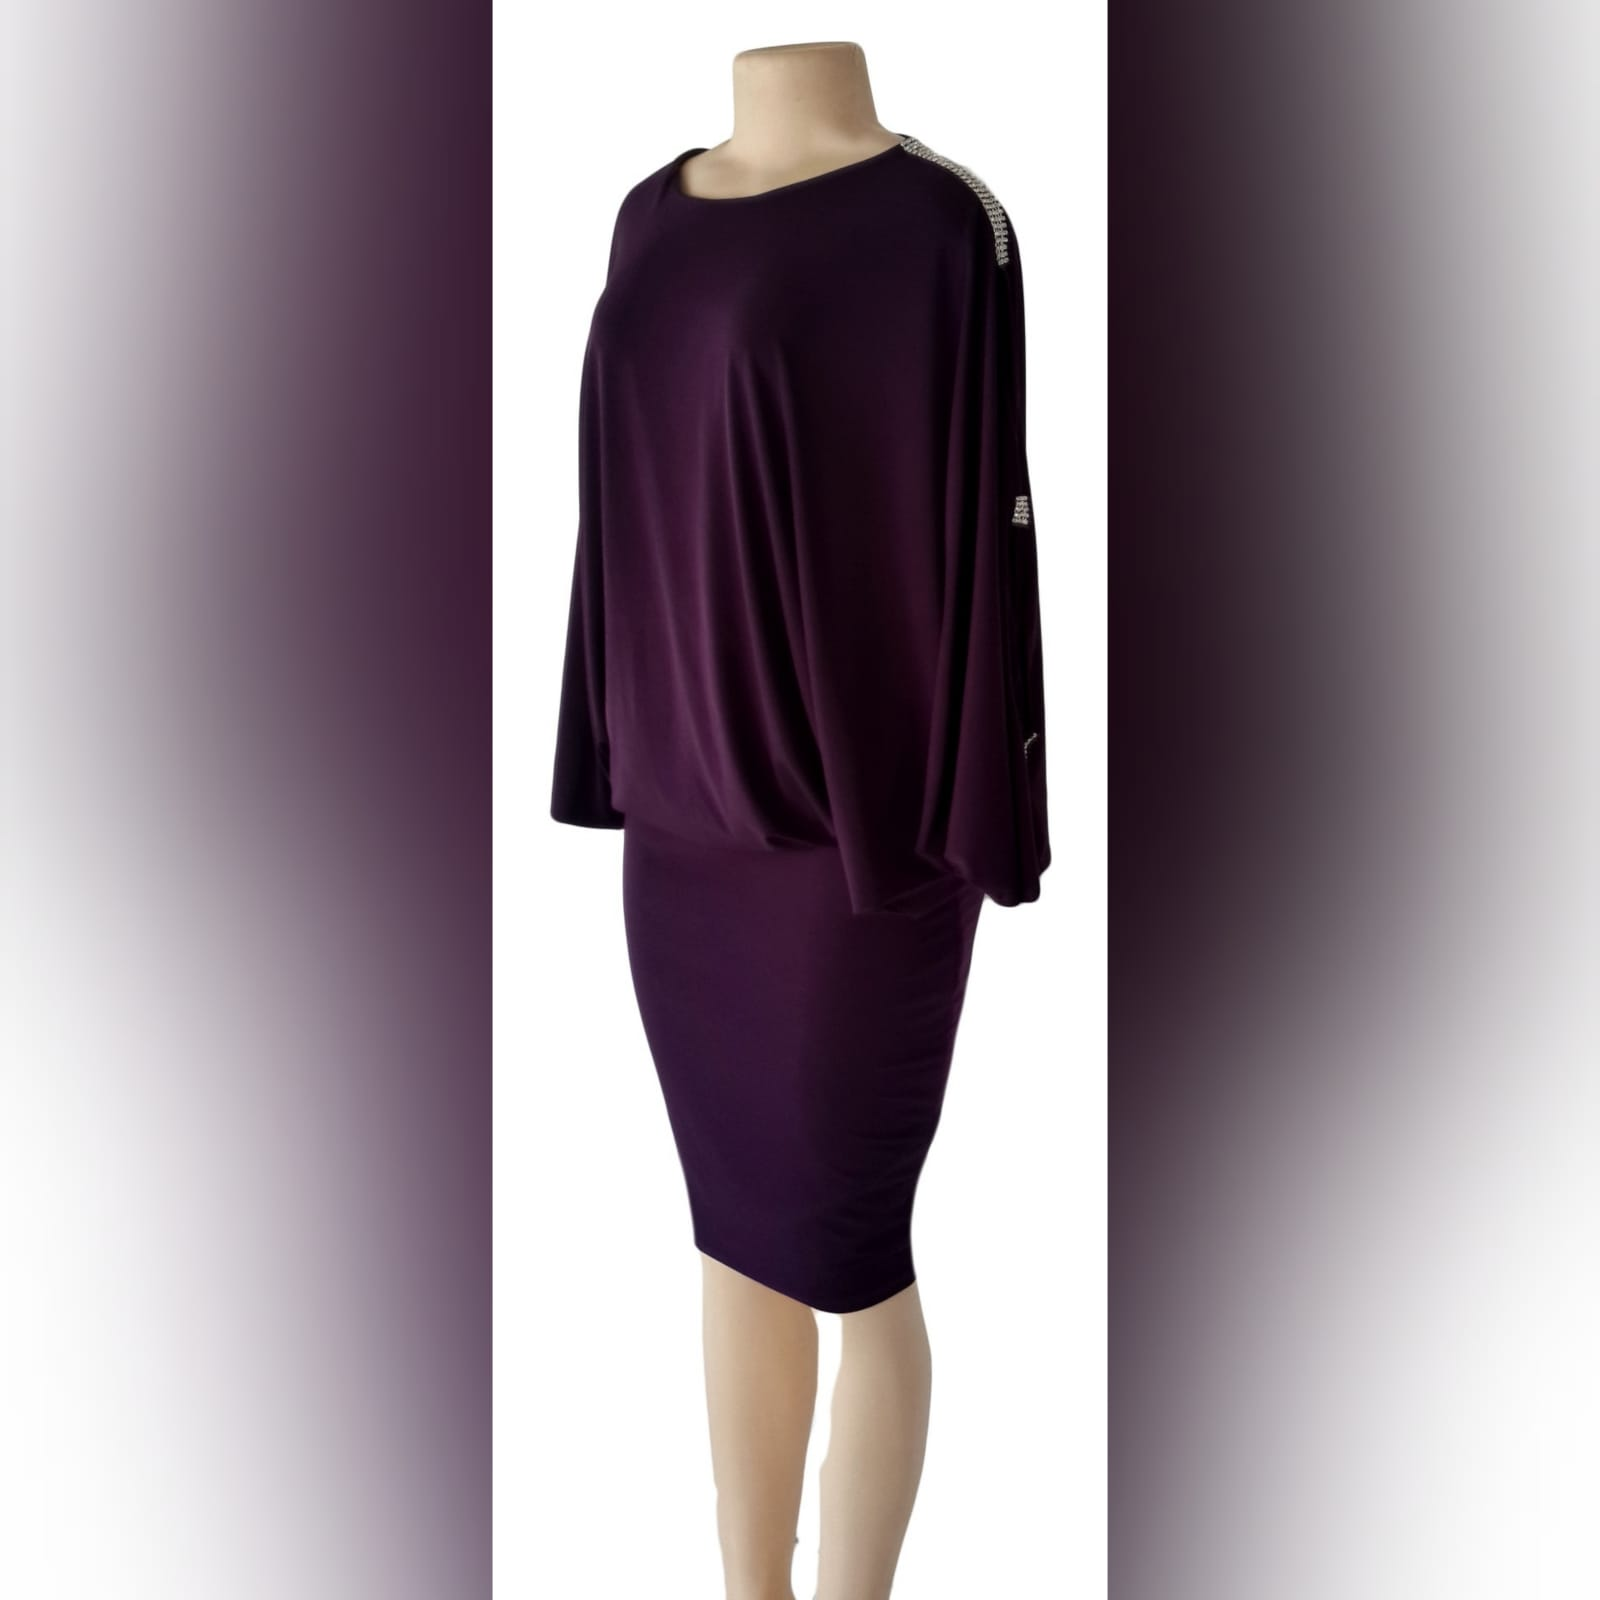 Plum smart casual knee length dress 1 plum smart casual knee length dress with wide sleeves and fitted hip area creating a mini skirt look